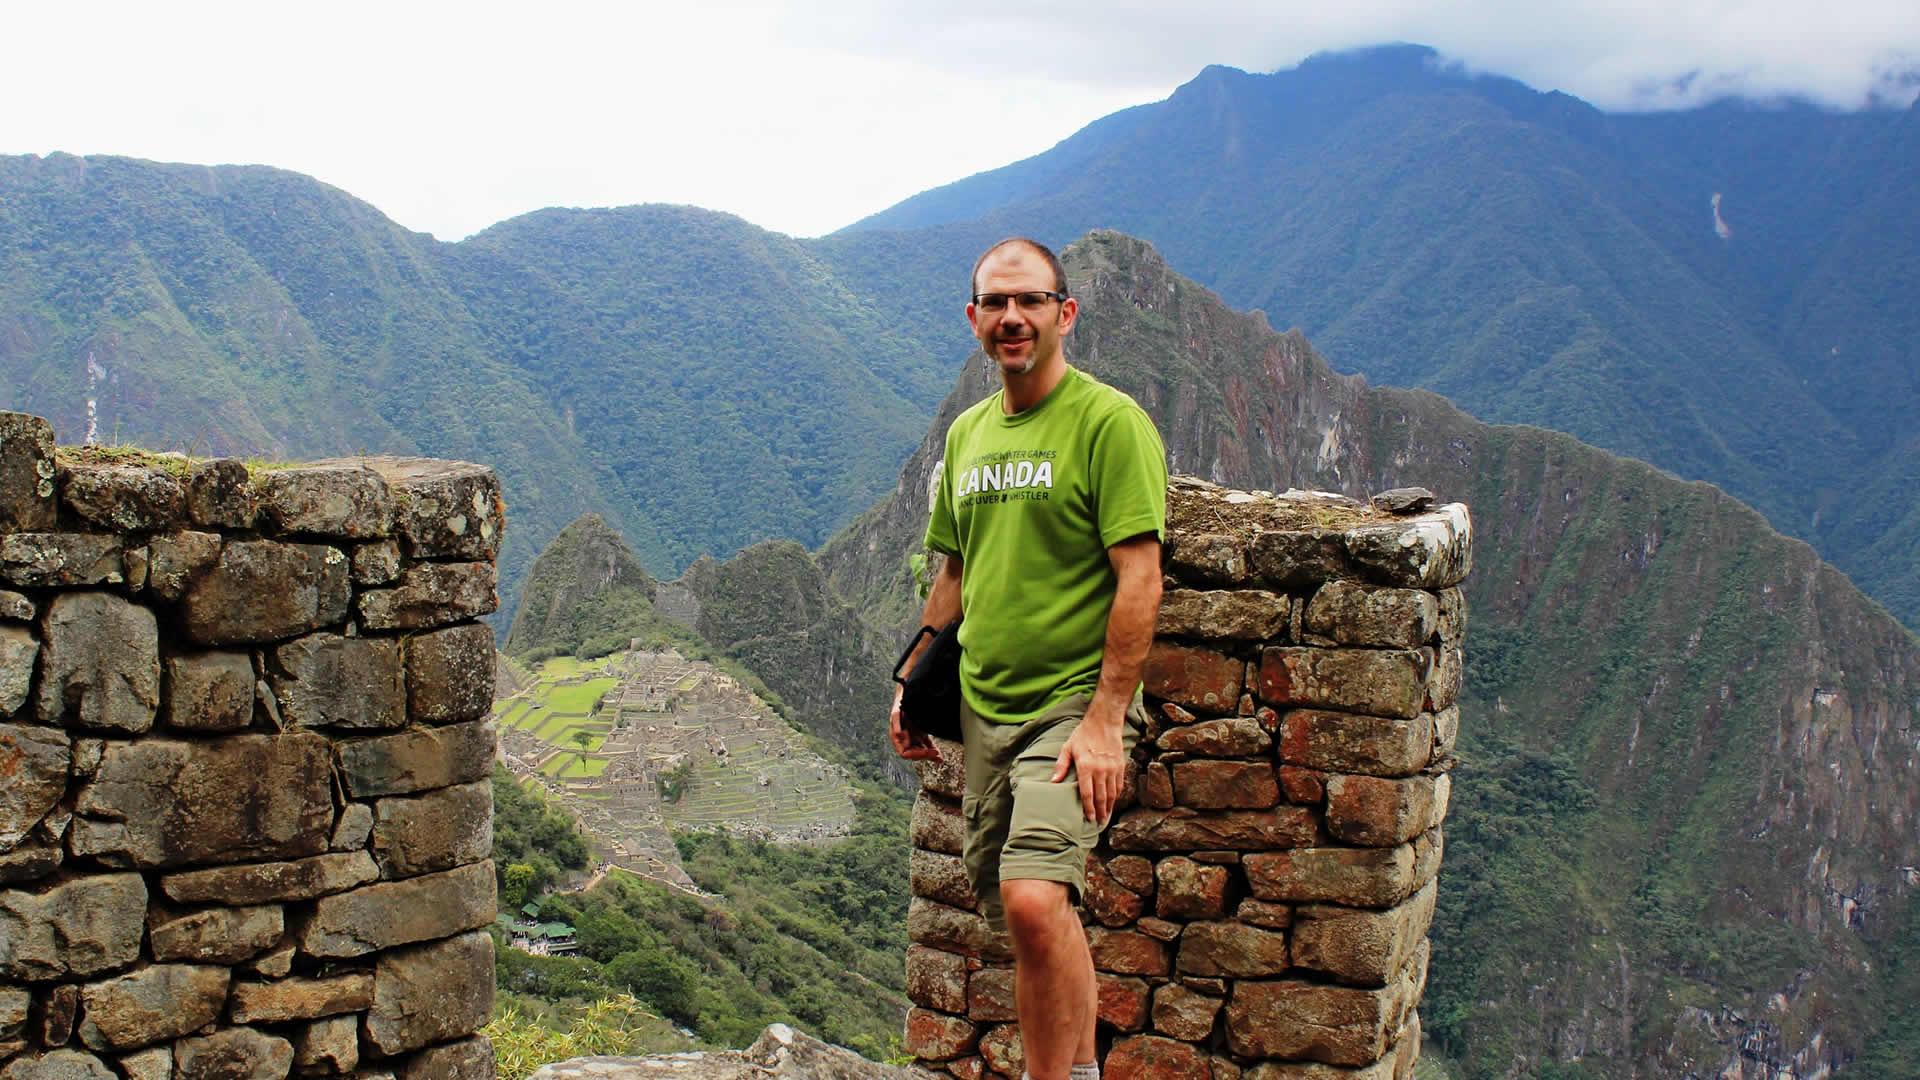 Tours en Cusco y Montaña 7 Colores 05 Días